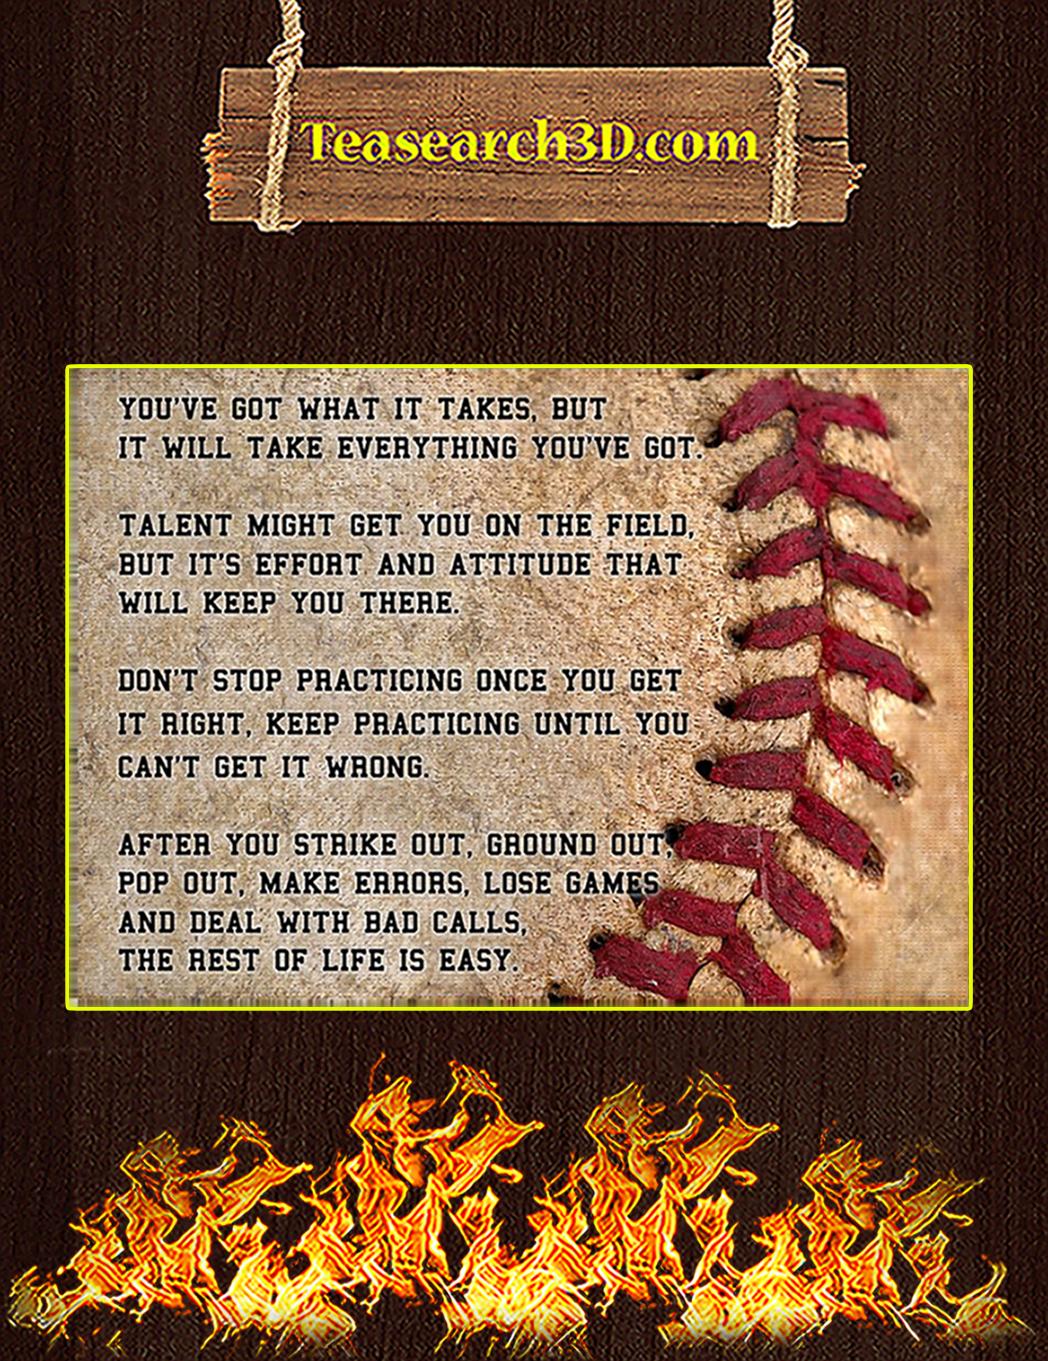 Baseball motivation you got what it takes poster A1